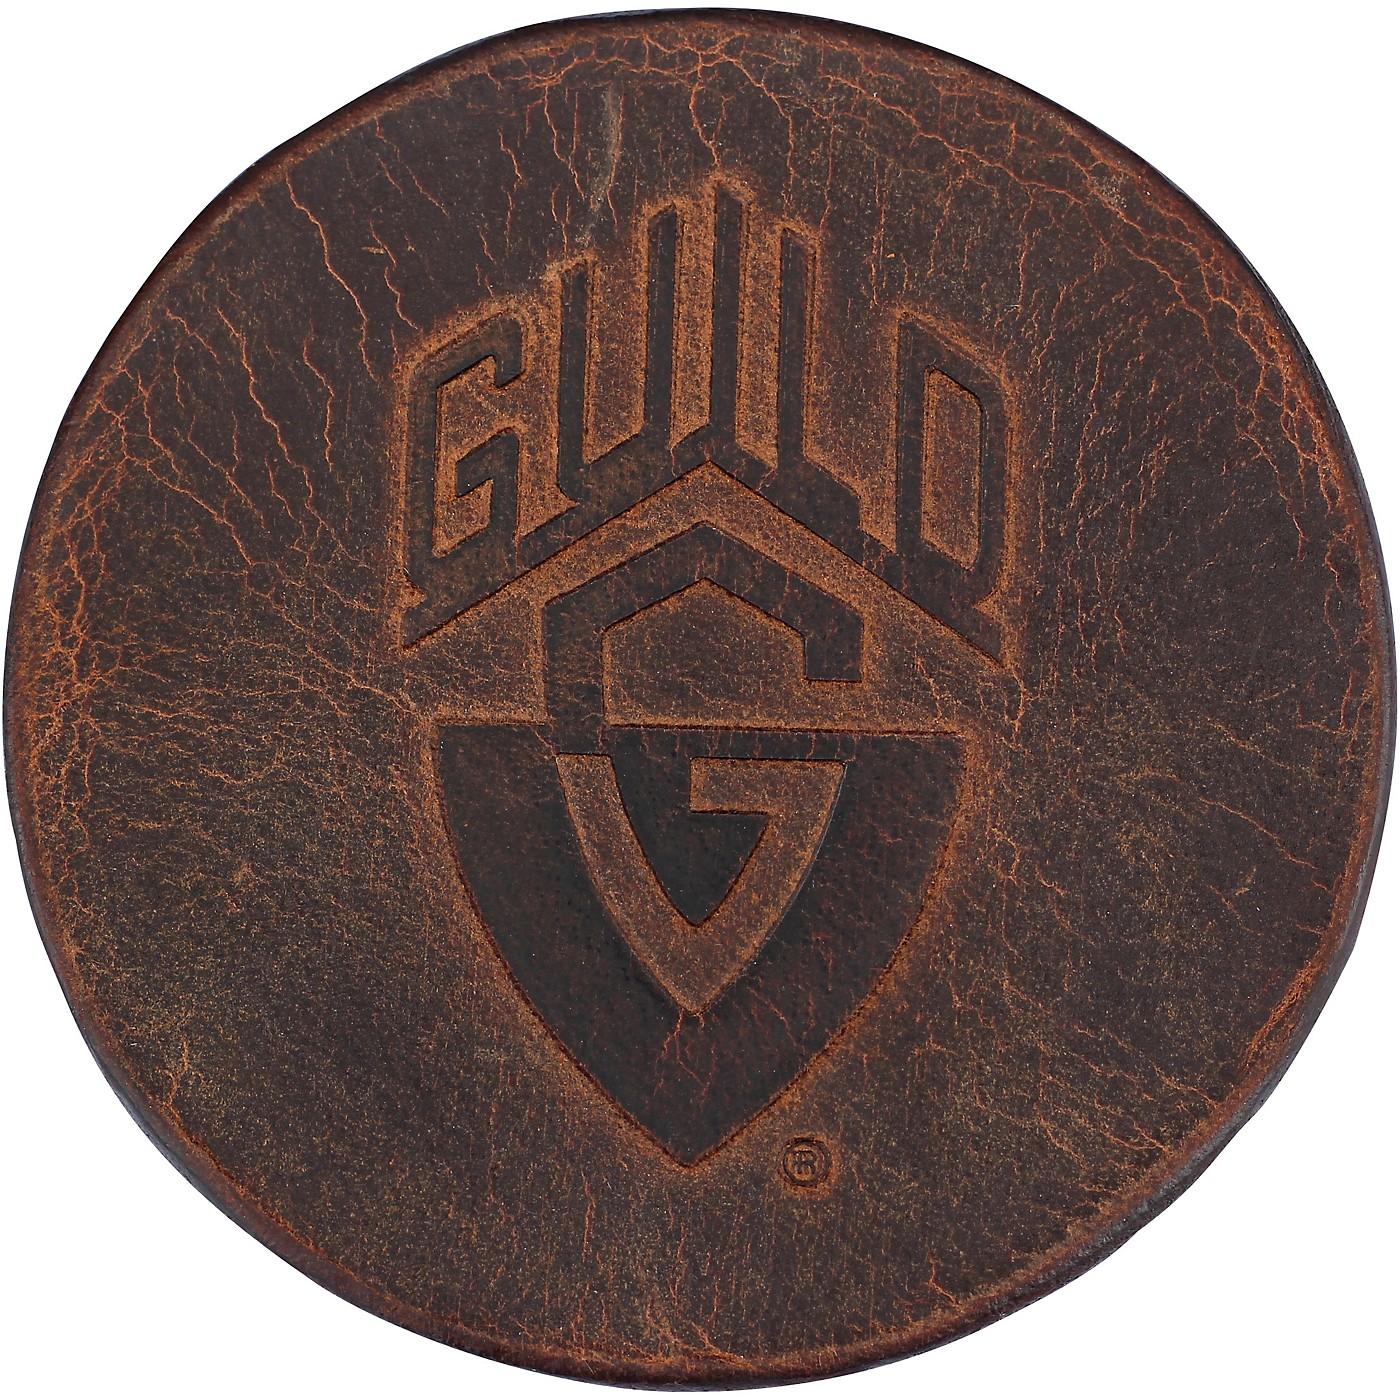 Guild Drink Coaster - Brown thumbnail